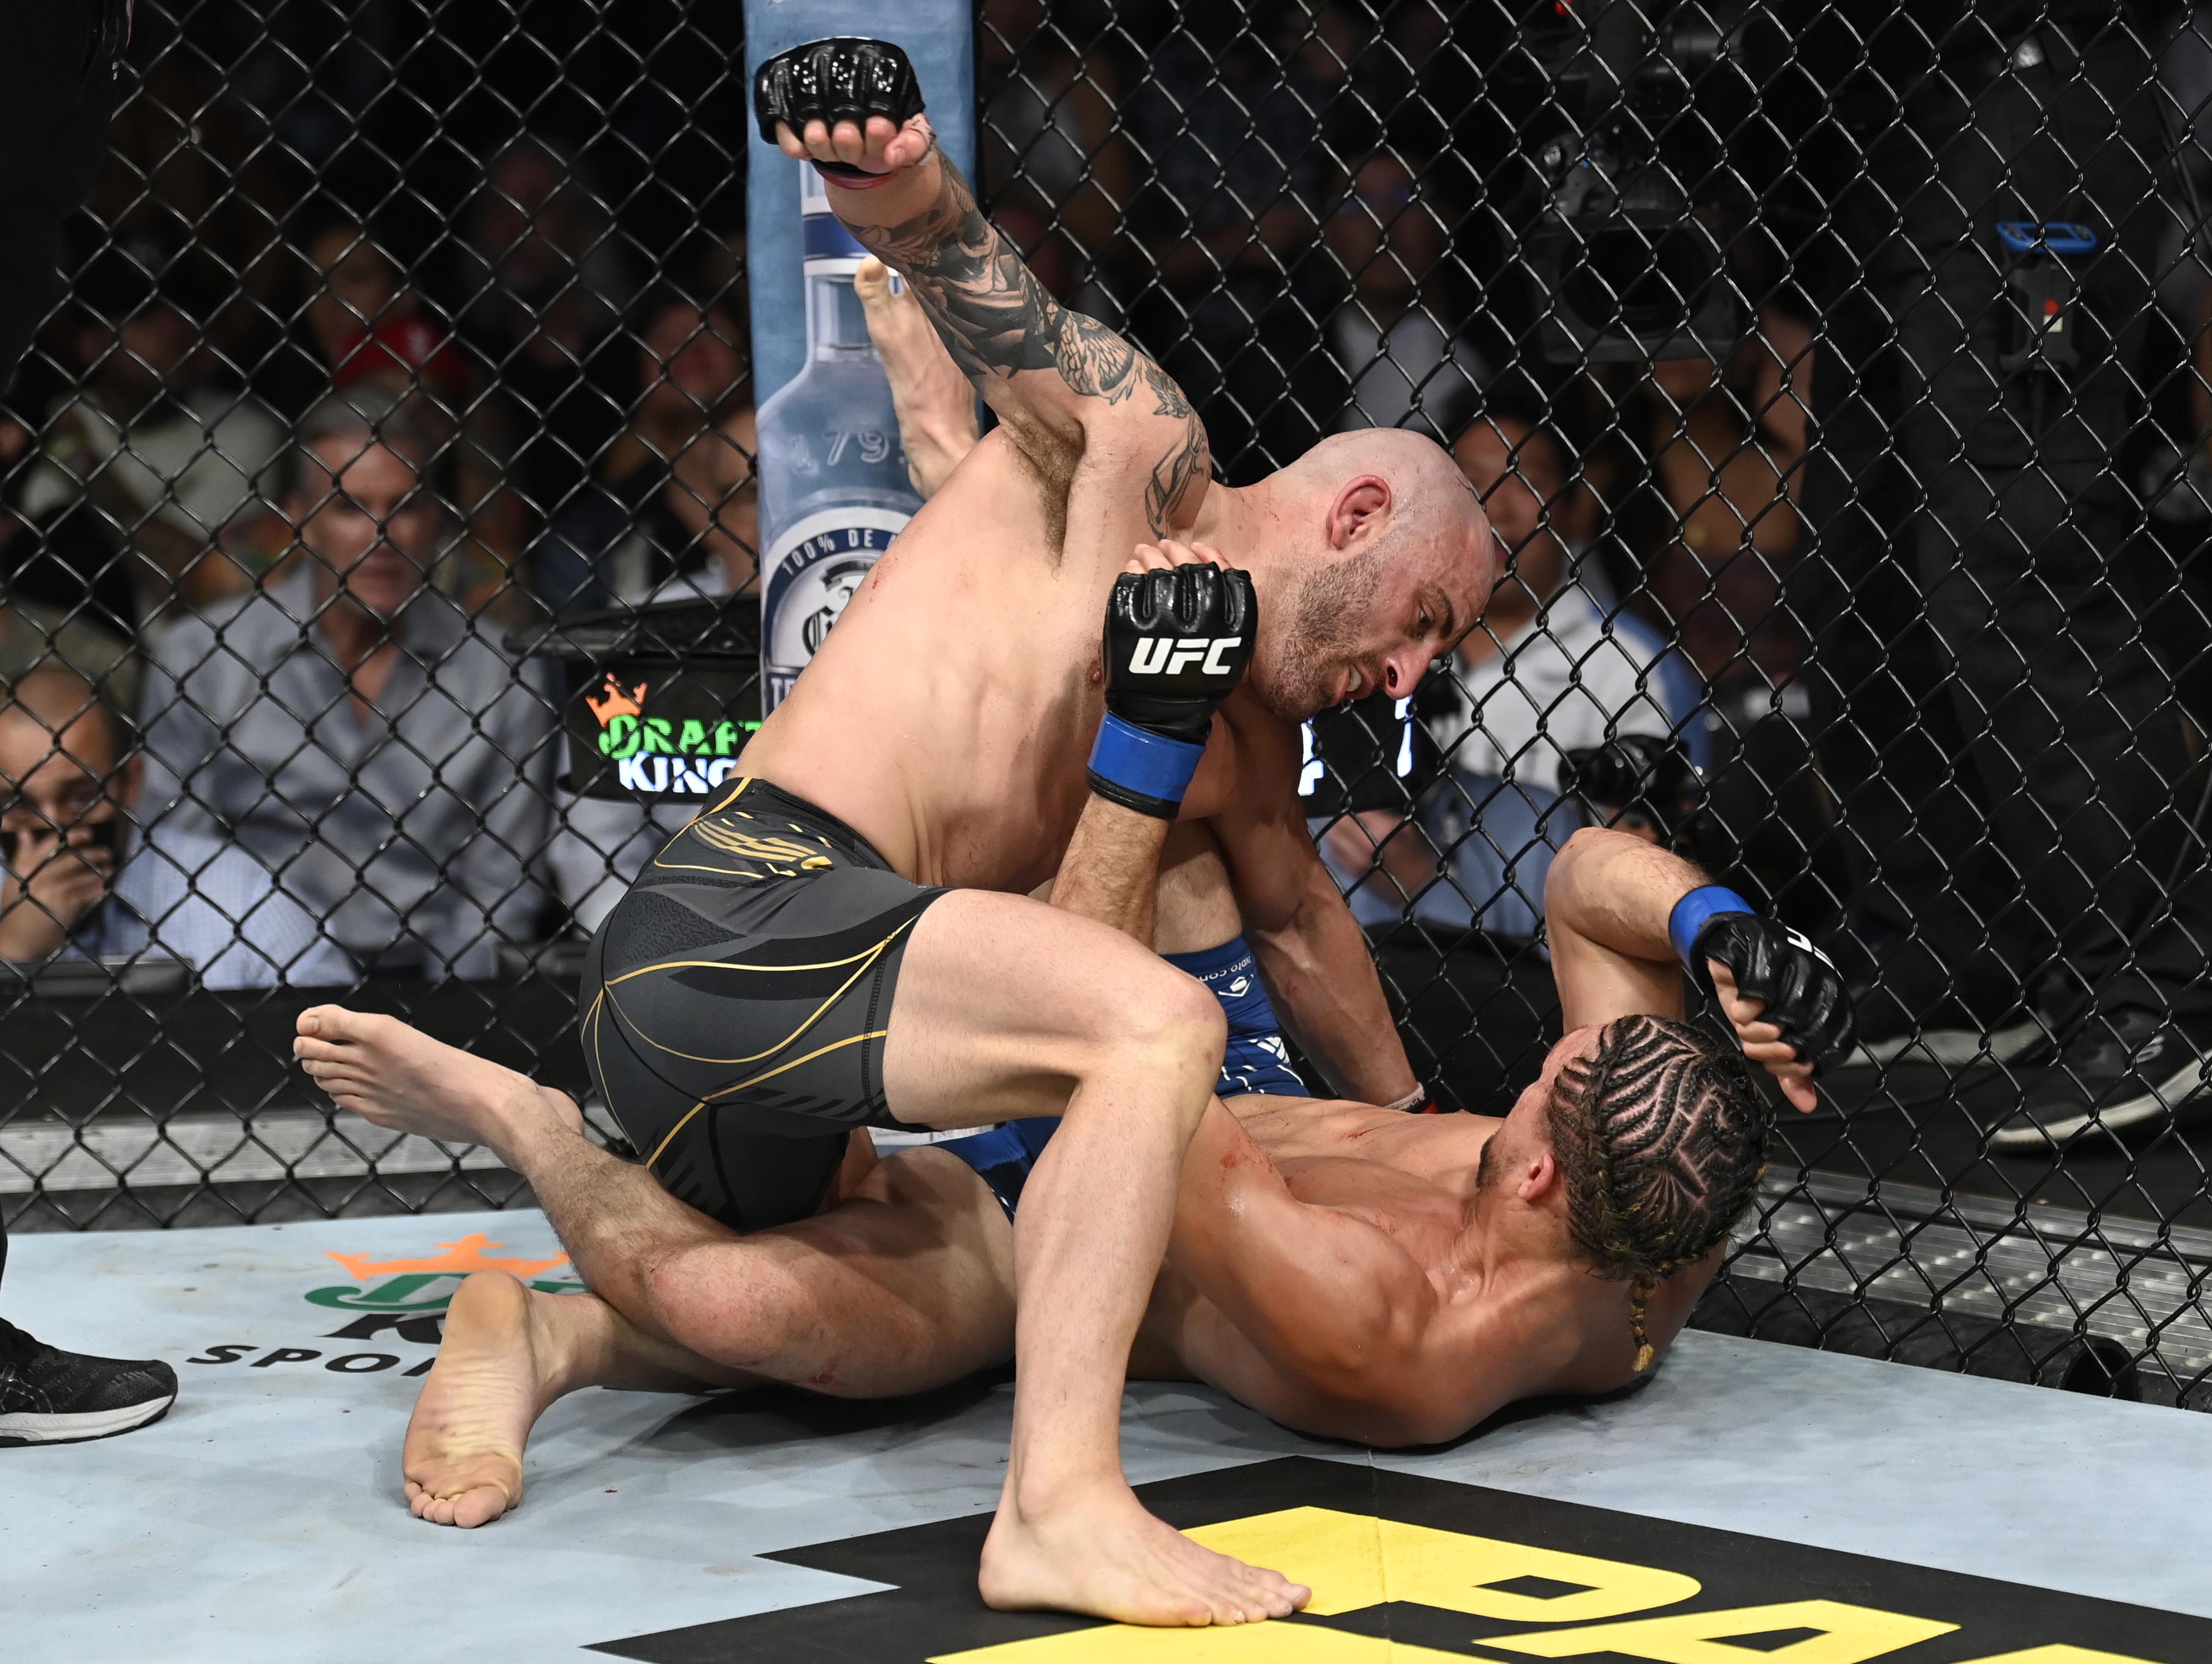 Alexander Volkanovski defeated Brian Ortega at UFC 266.